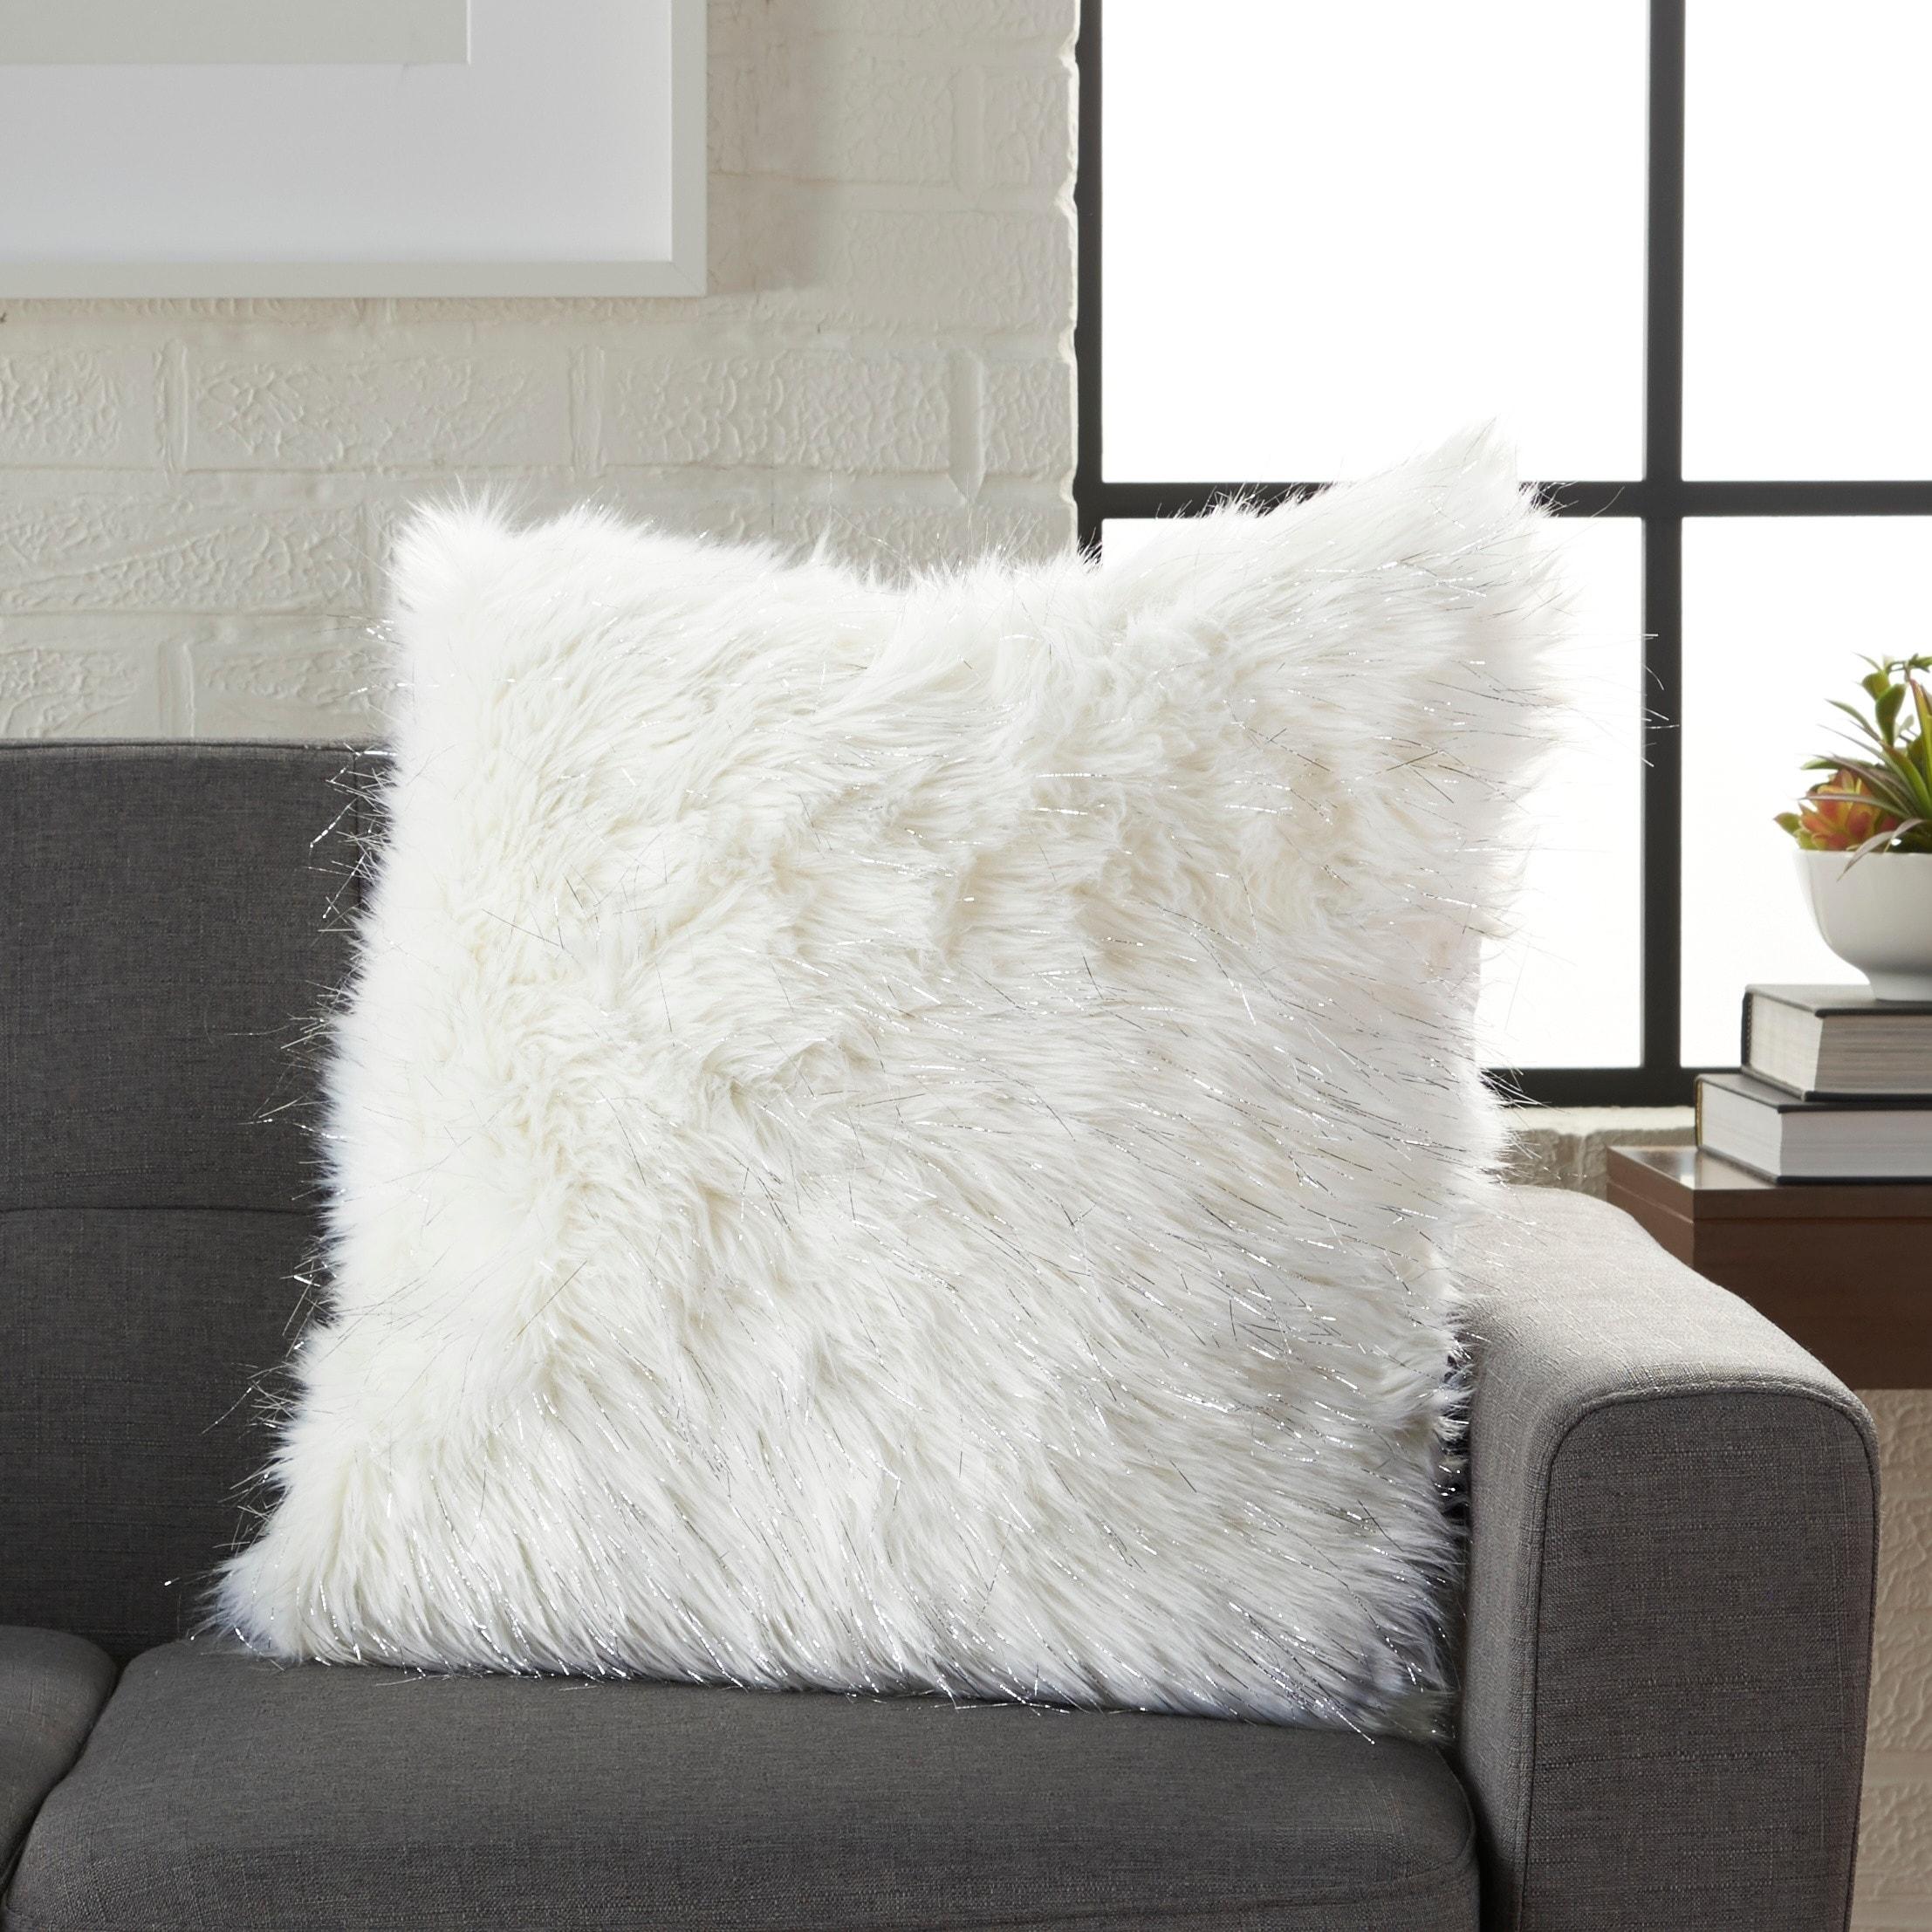 Faux Fur Decorative Pillow.Silver Orchid Henry White Faux Fur Decorative Throw Pillow